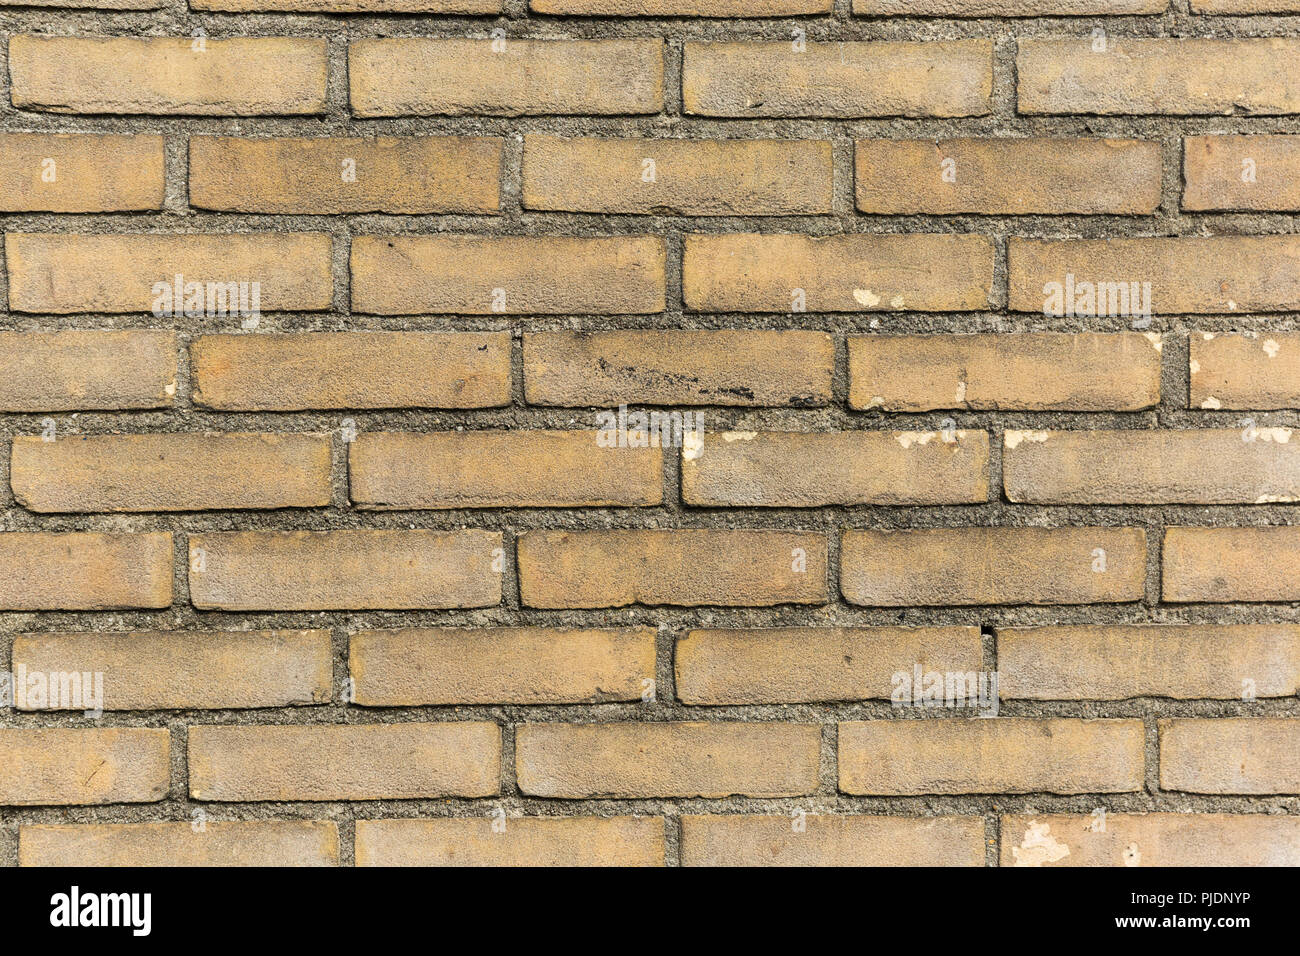 Brick Bricks Brickwork Building Photos & Brick Bricks